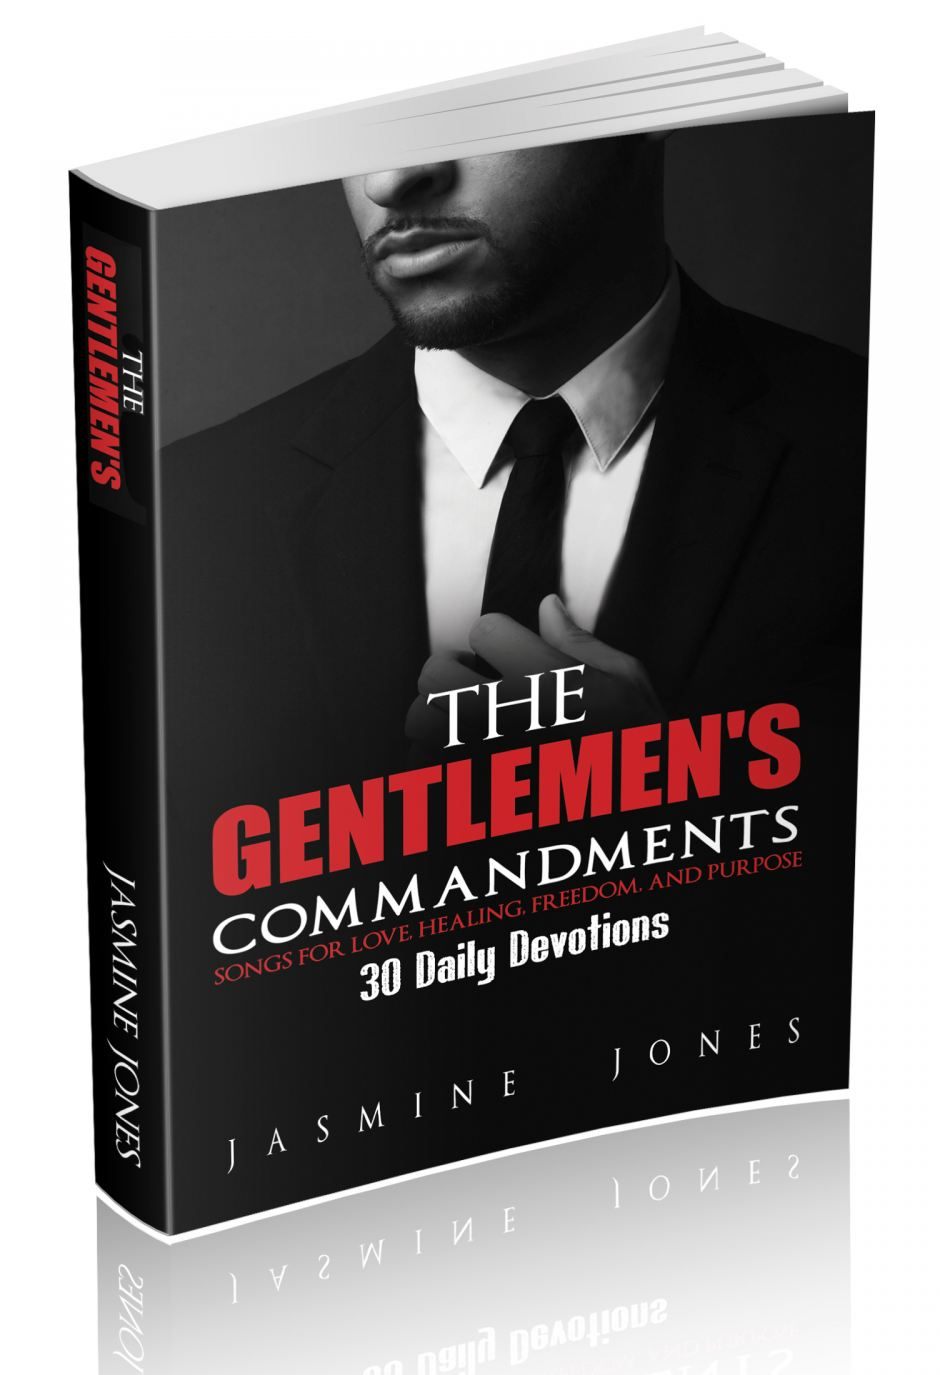 The Gentlemen's Commandments releases on International Men's Day November 19th.